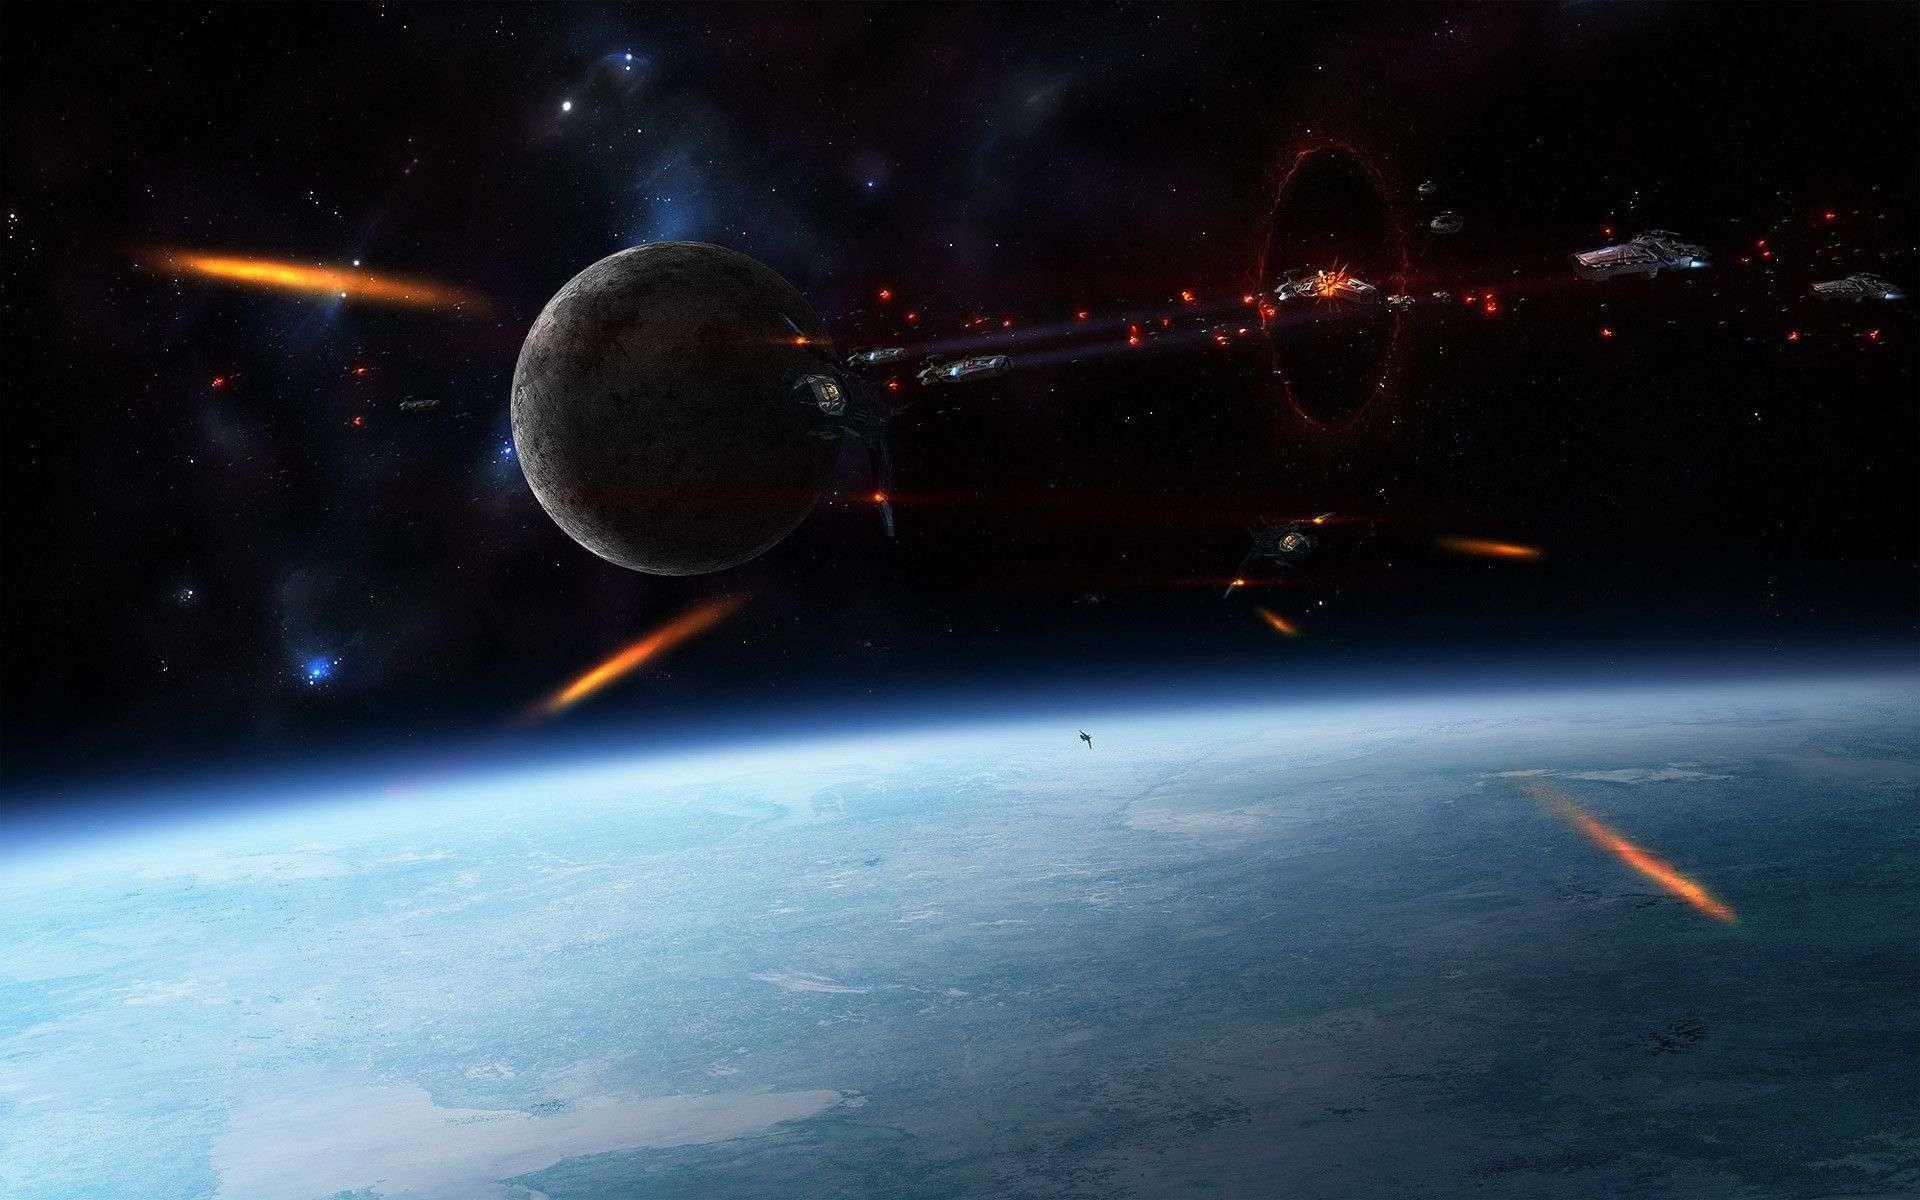 star wars space wallpaper